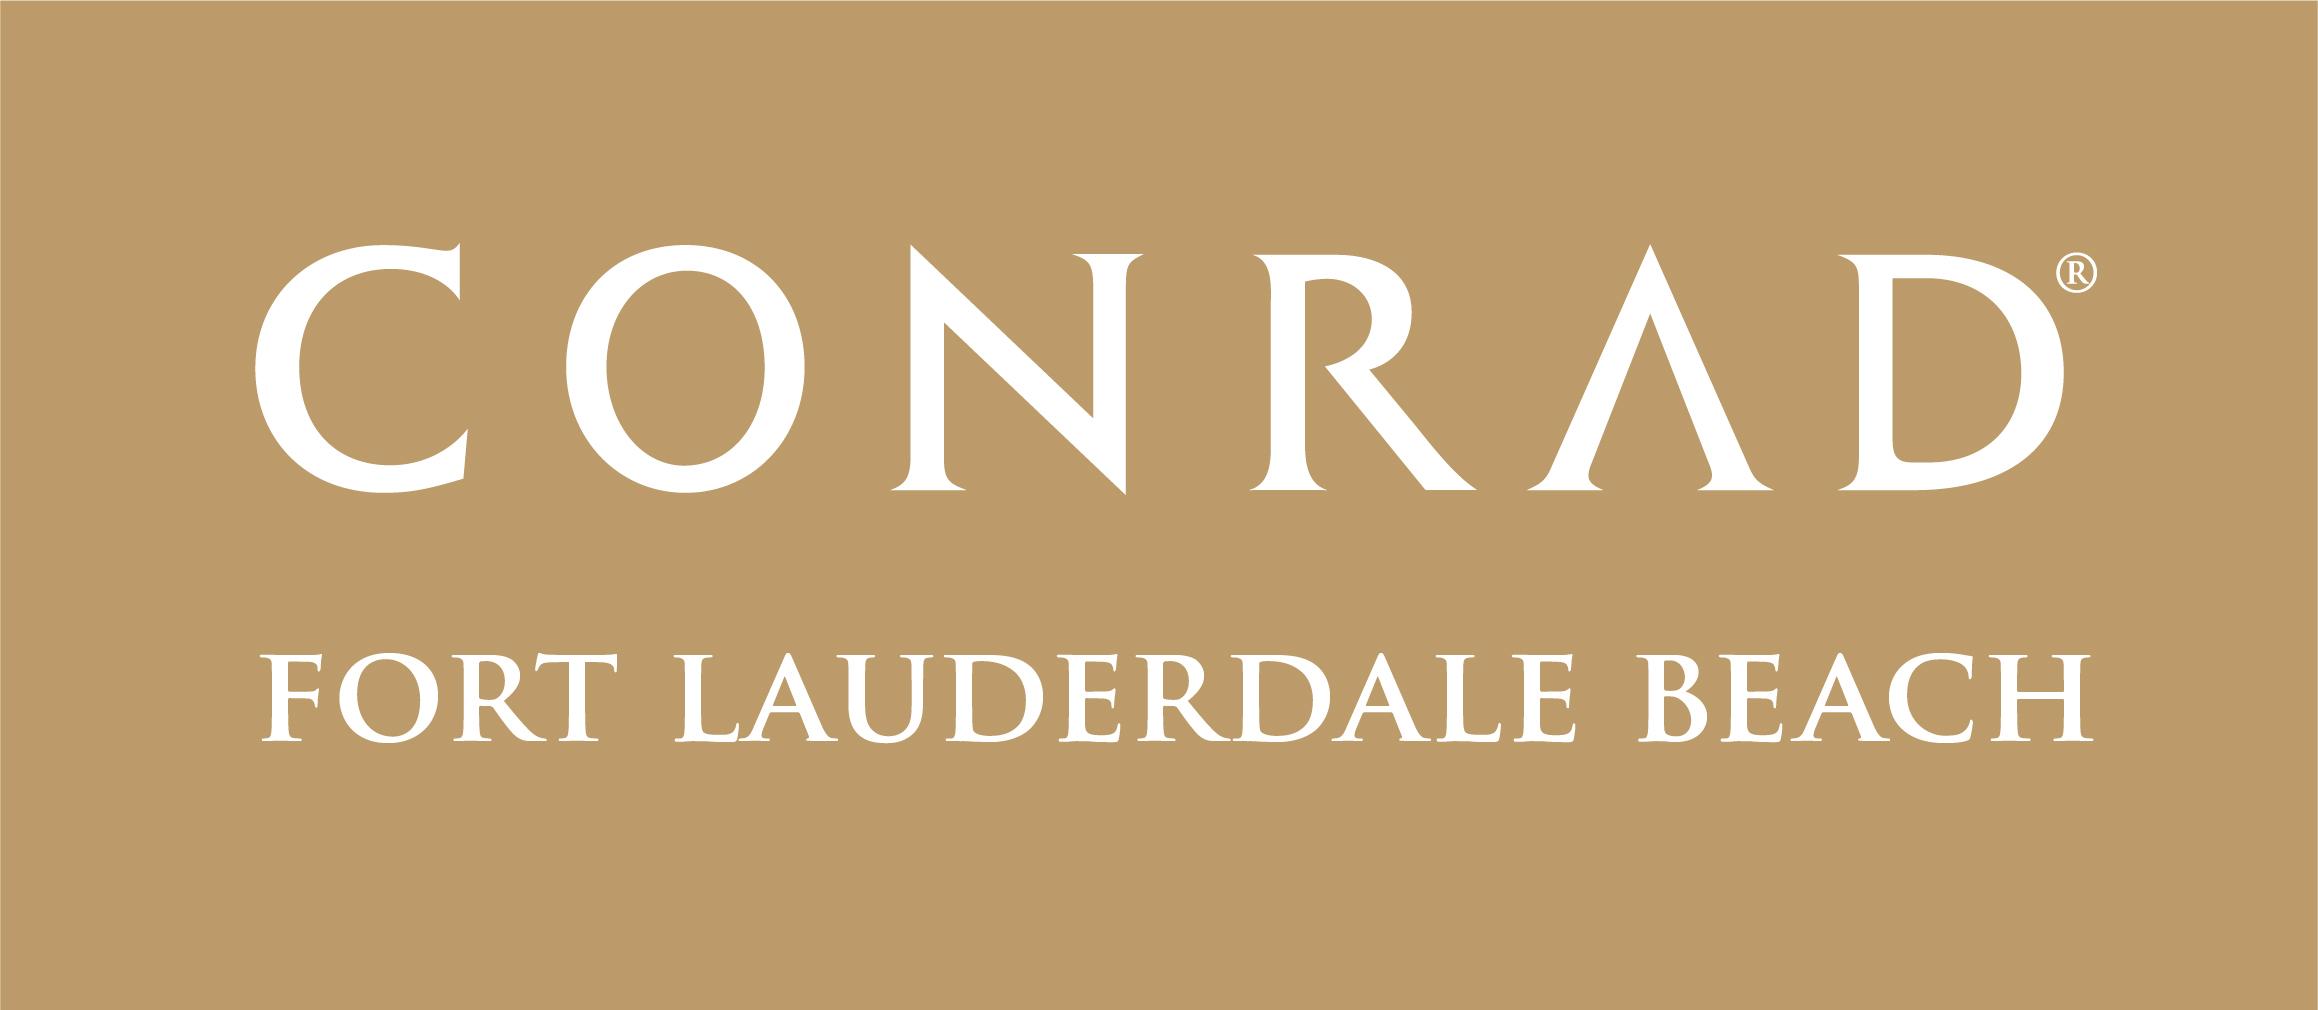 Conrad_Fort_Lauderdale_RGB_FREE.jpg